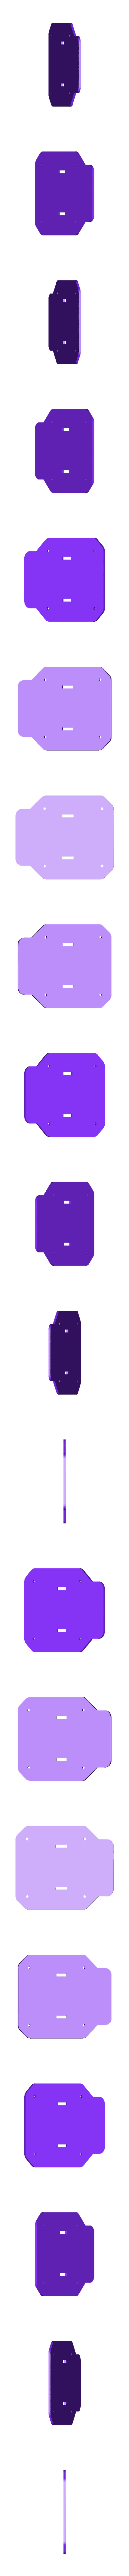 Battery_Plate.stl Download free STL file Experimental Multirotor • 3D printable model, SeanTheITGuy